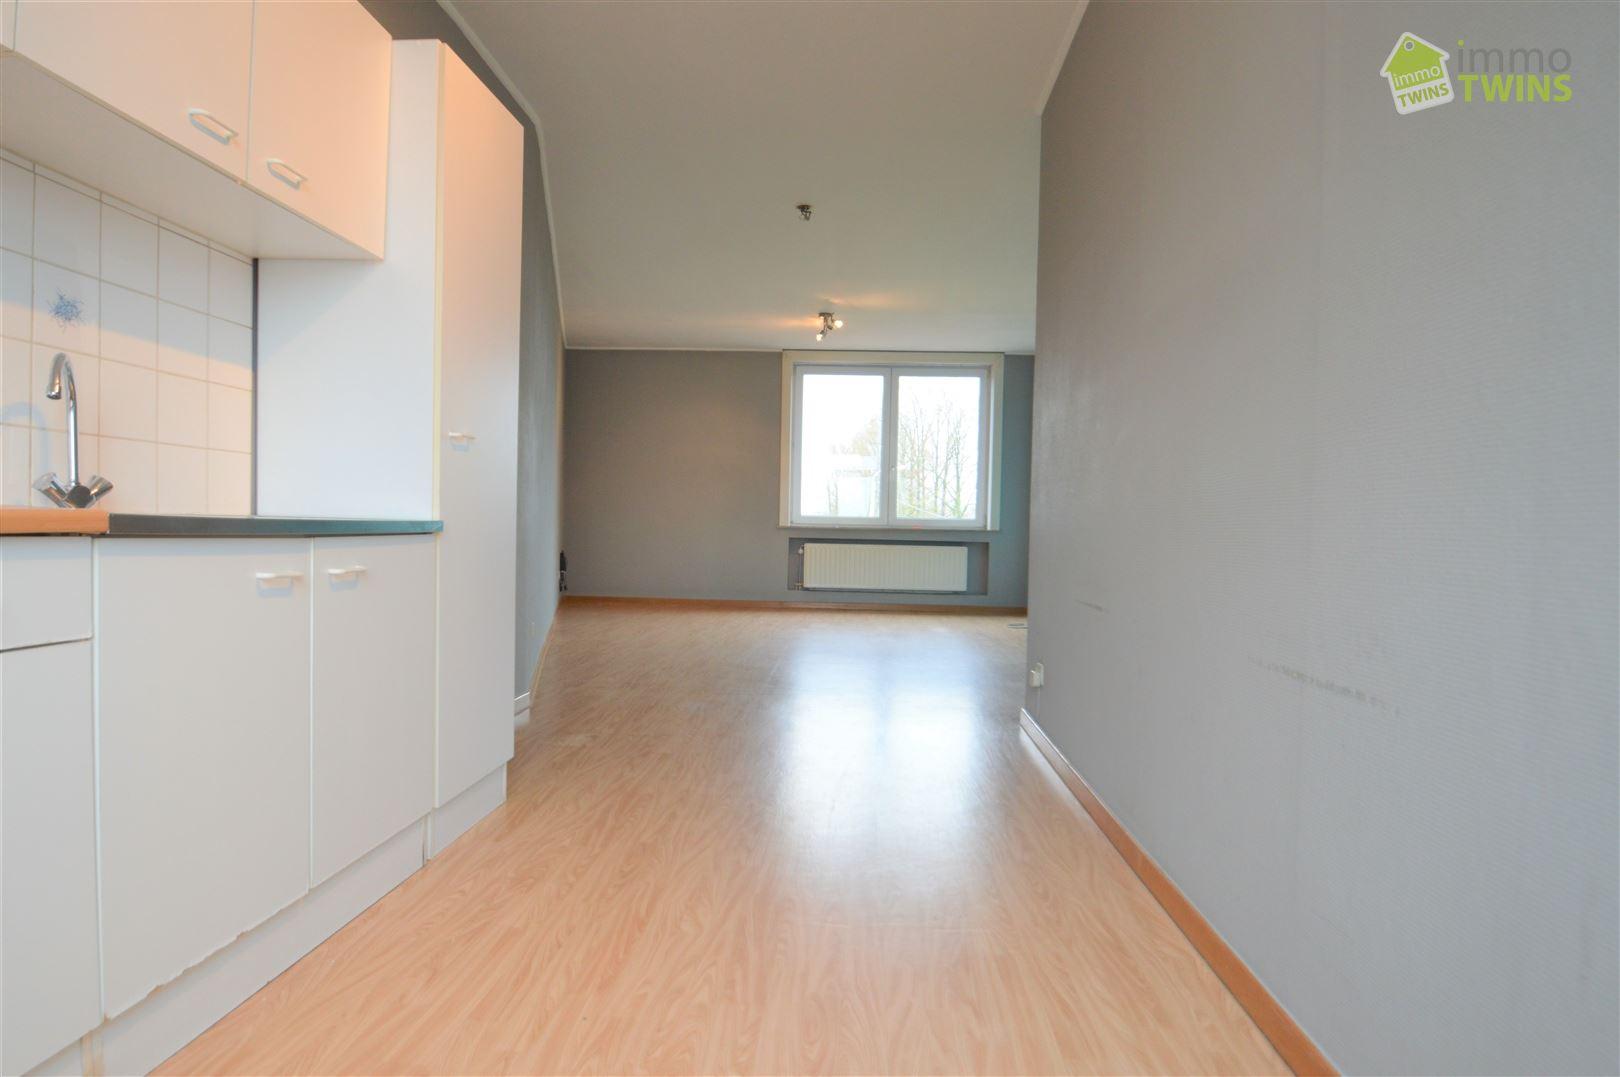 Foto 6 : Appartement te 9200 DENDERMONDE (België) - Prijs € 575